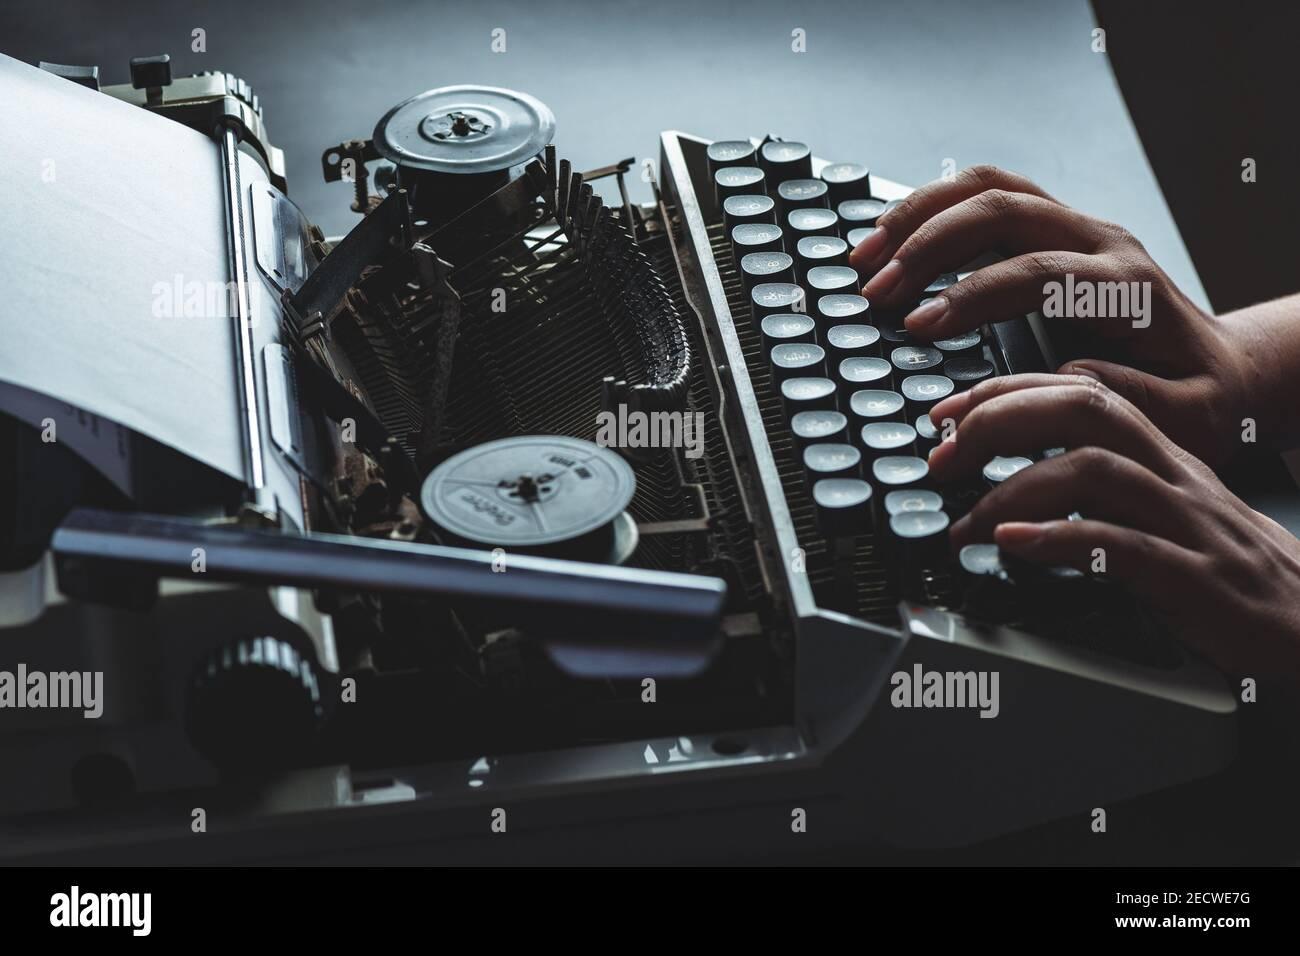 Old black and white indian manual model typewriter Stock Photo